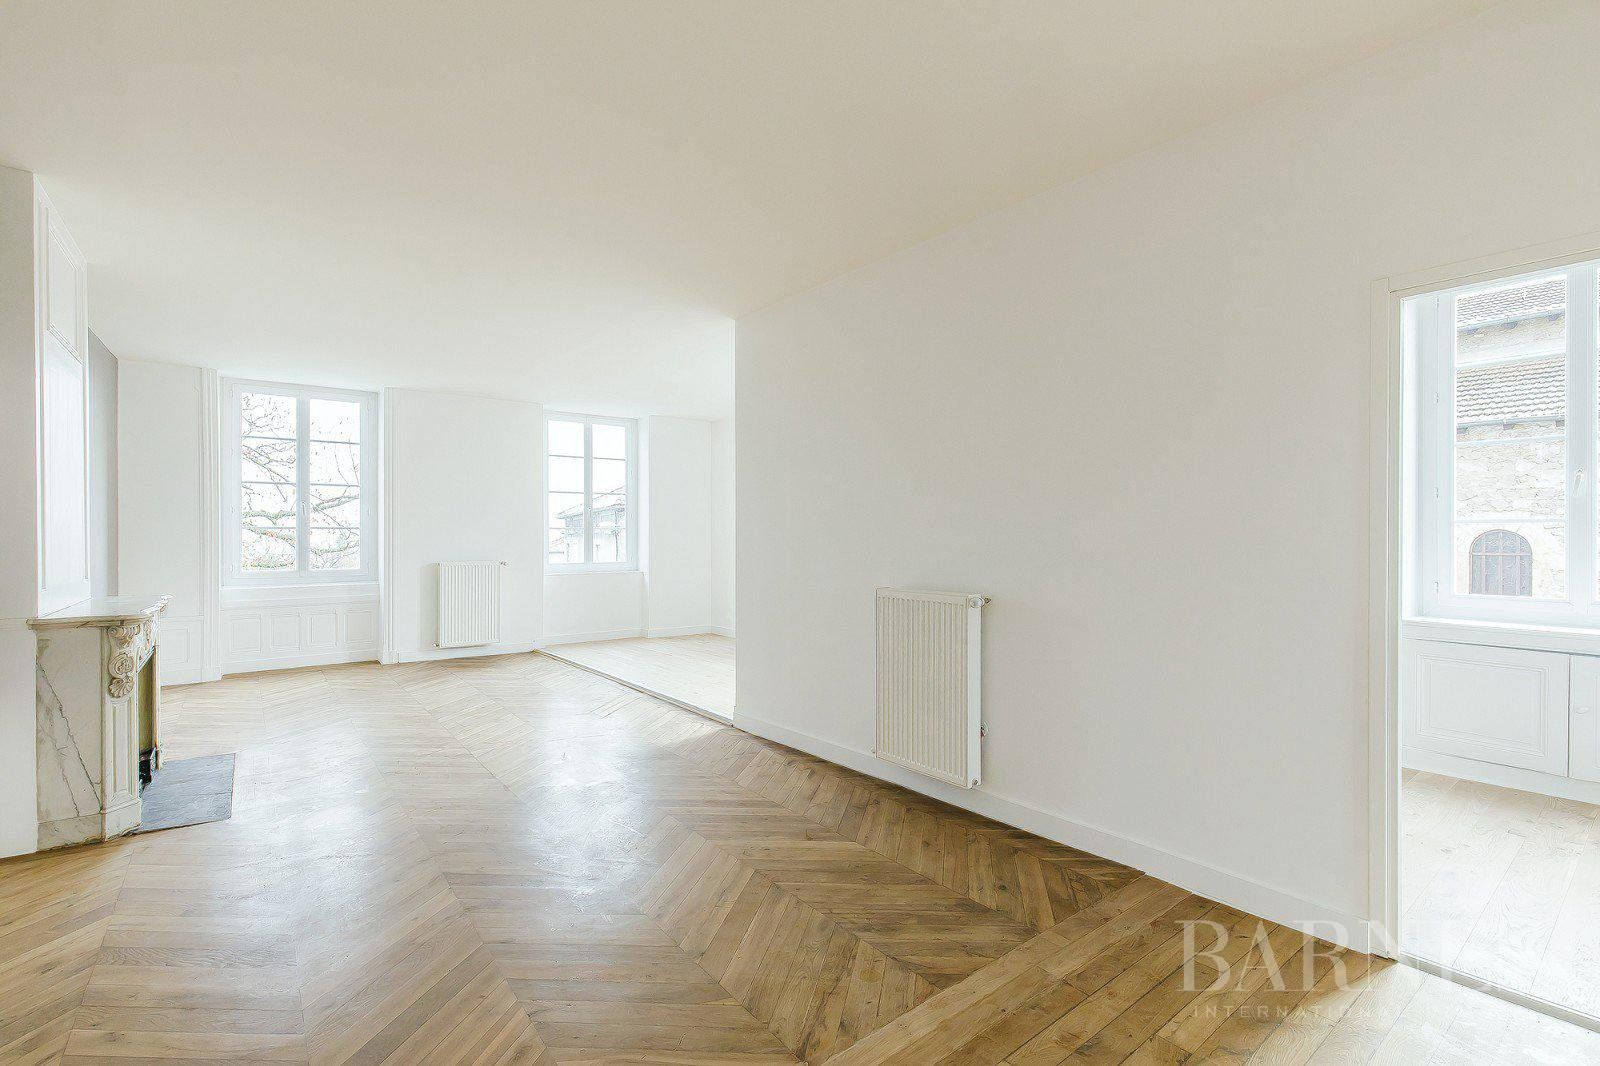 Saint-Genis-les-Ollières - Apartment of 77 sqm in a Manor - 2 bedrooms